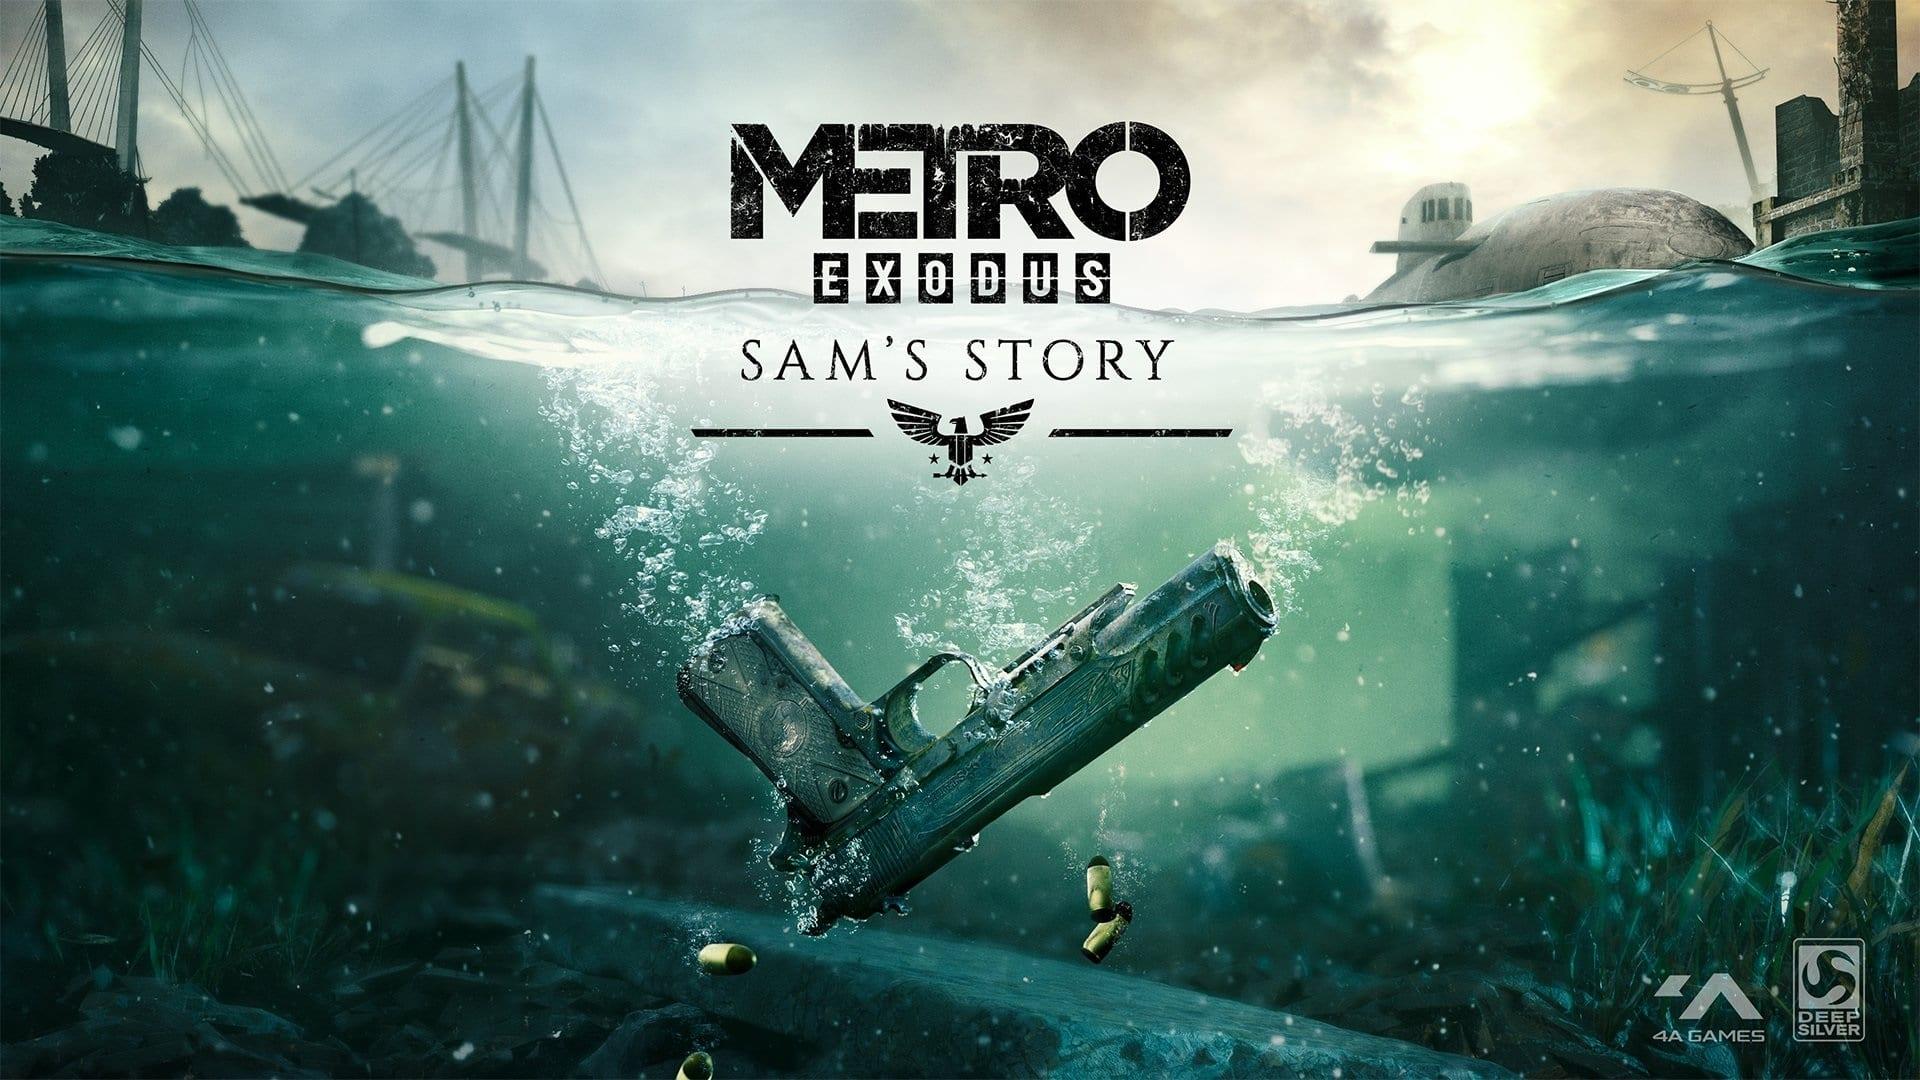 Metro Exodus, Sam's Story, 4A Games